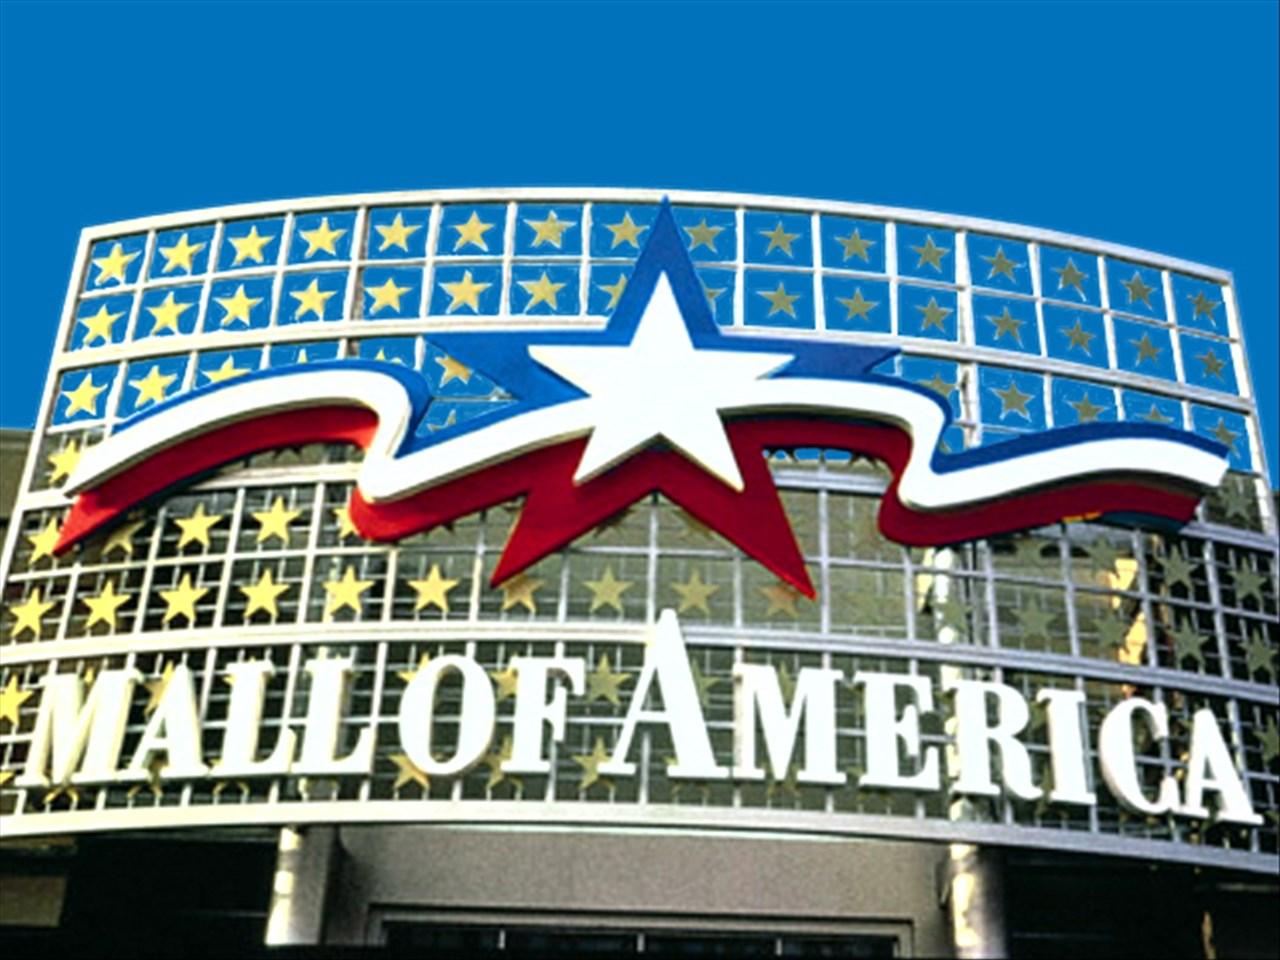 mall of america_1487817404499.jpg